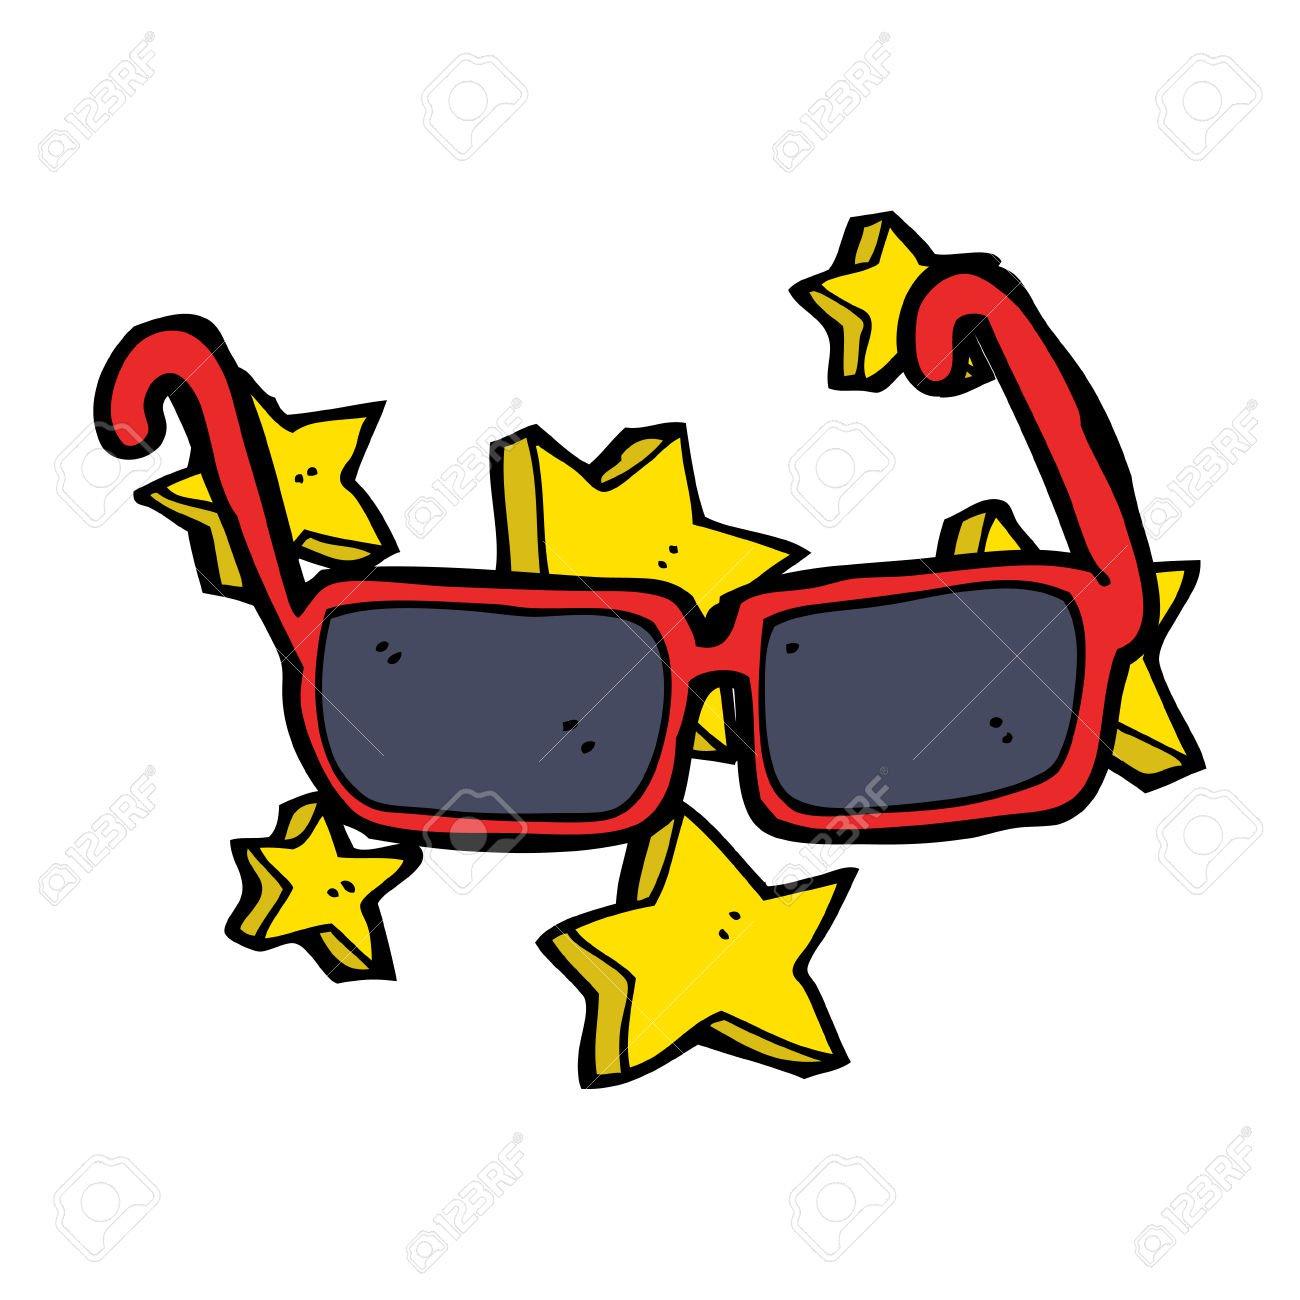 Desenhos Animados Caros óculos Royalty Free Cliparts, Vetores, E